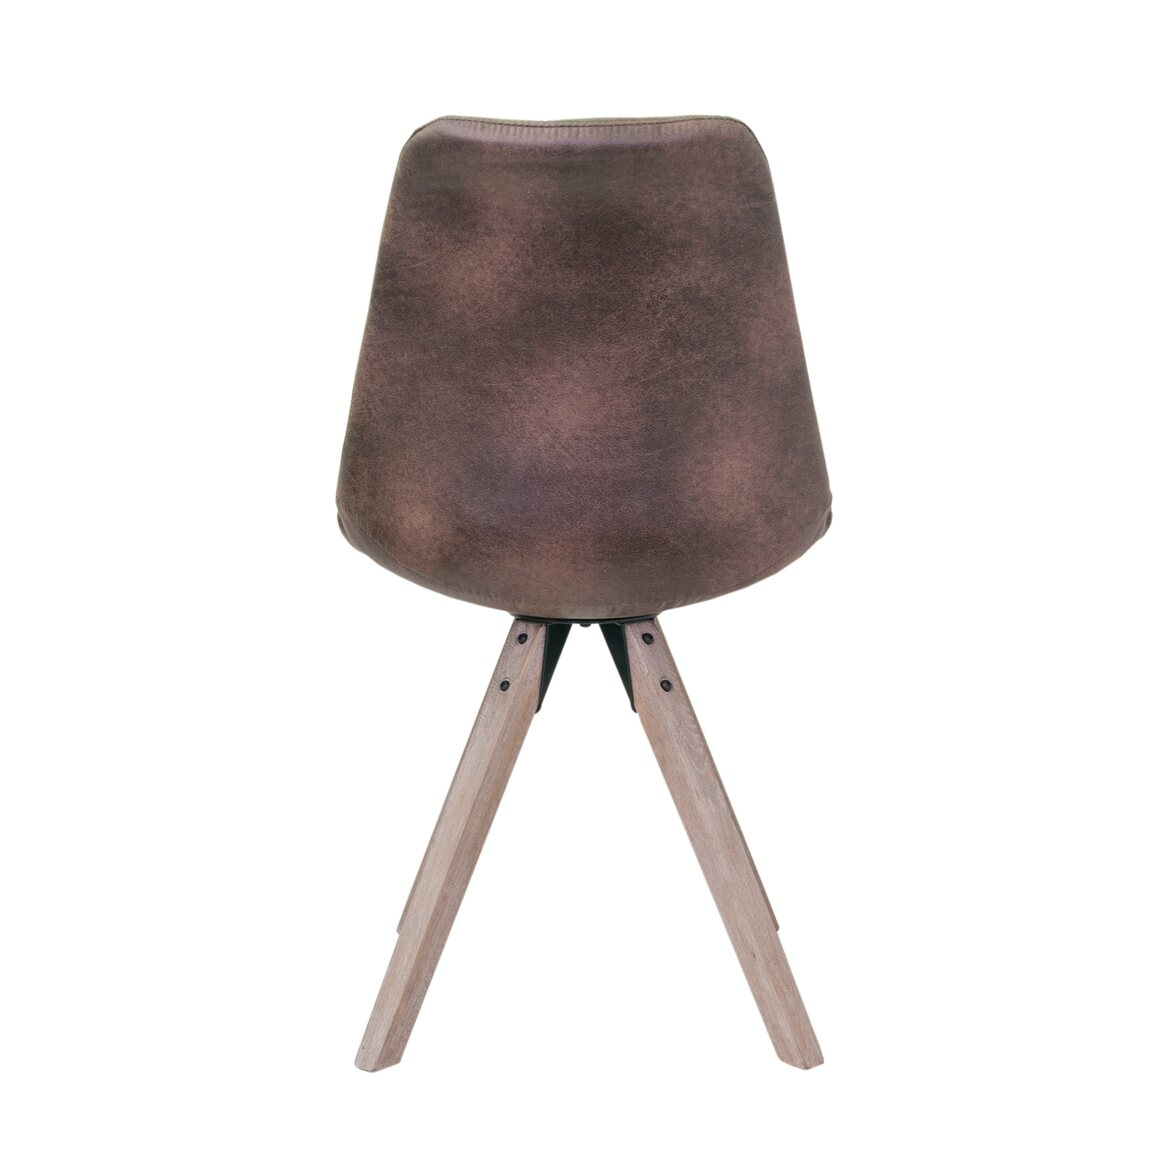 Стул Dexx brown 3 | Обеденные стулья Kingsby